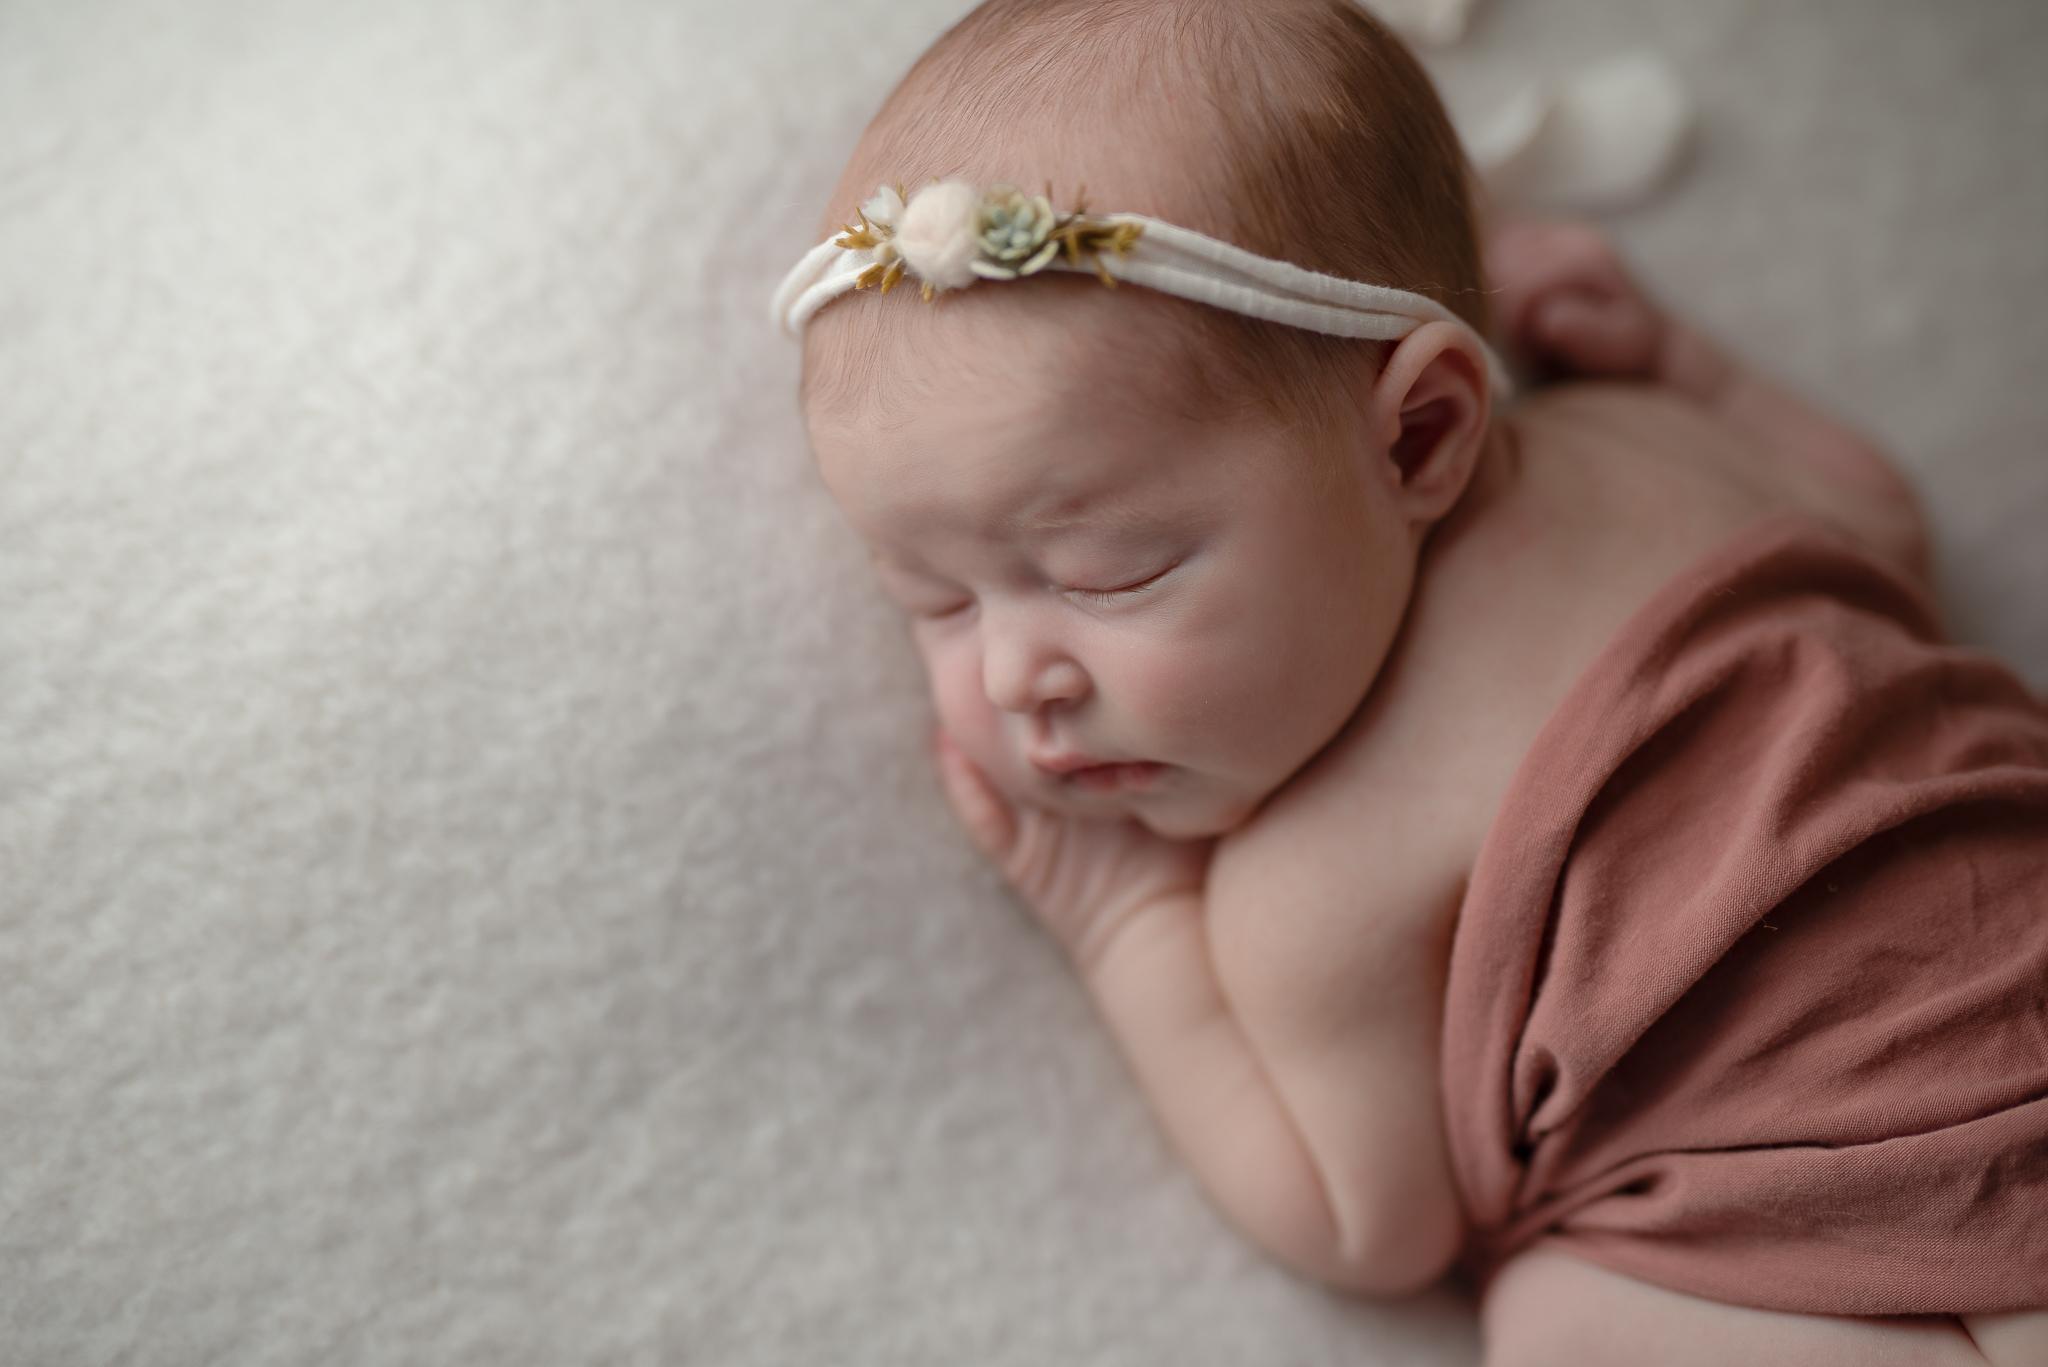 Newborn577NaomiLuciennePhotography032019-Edit.jpg